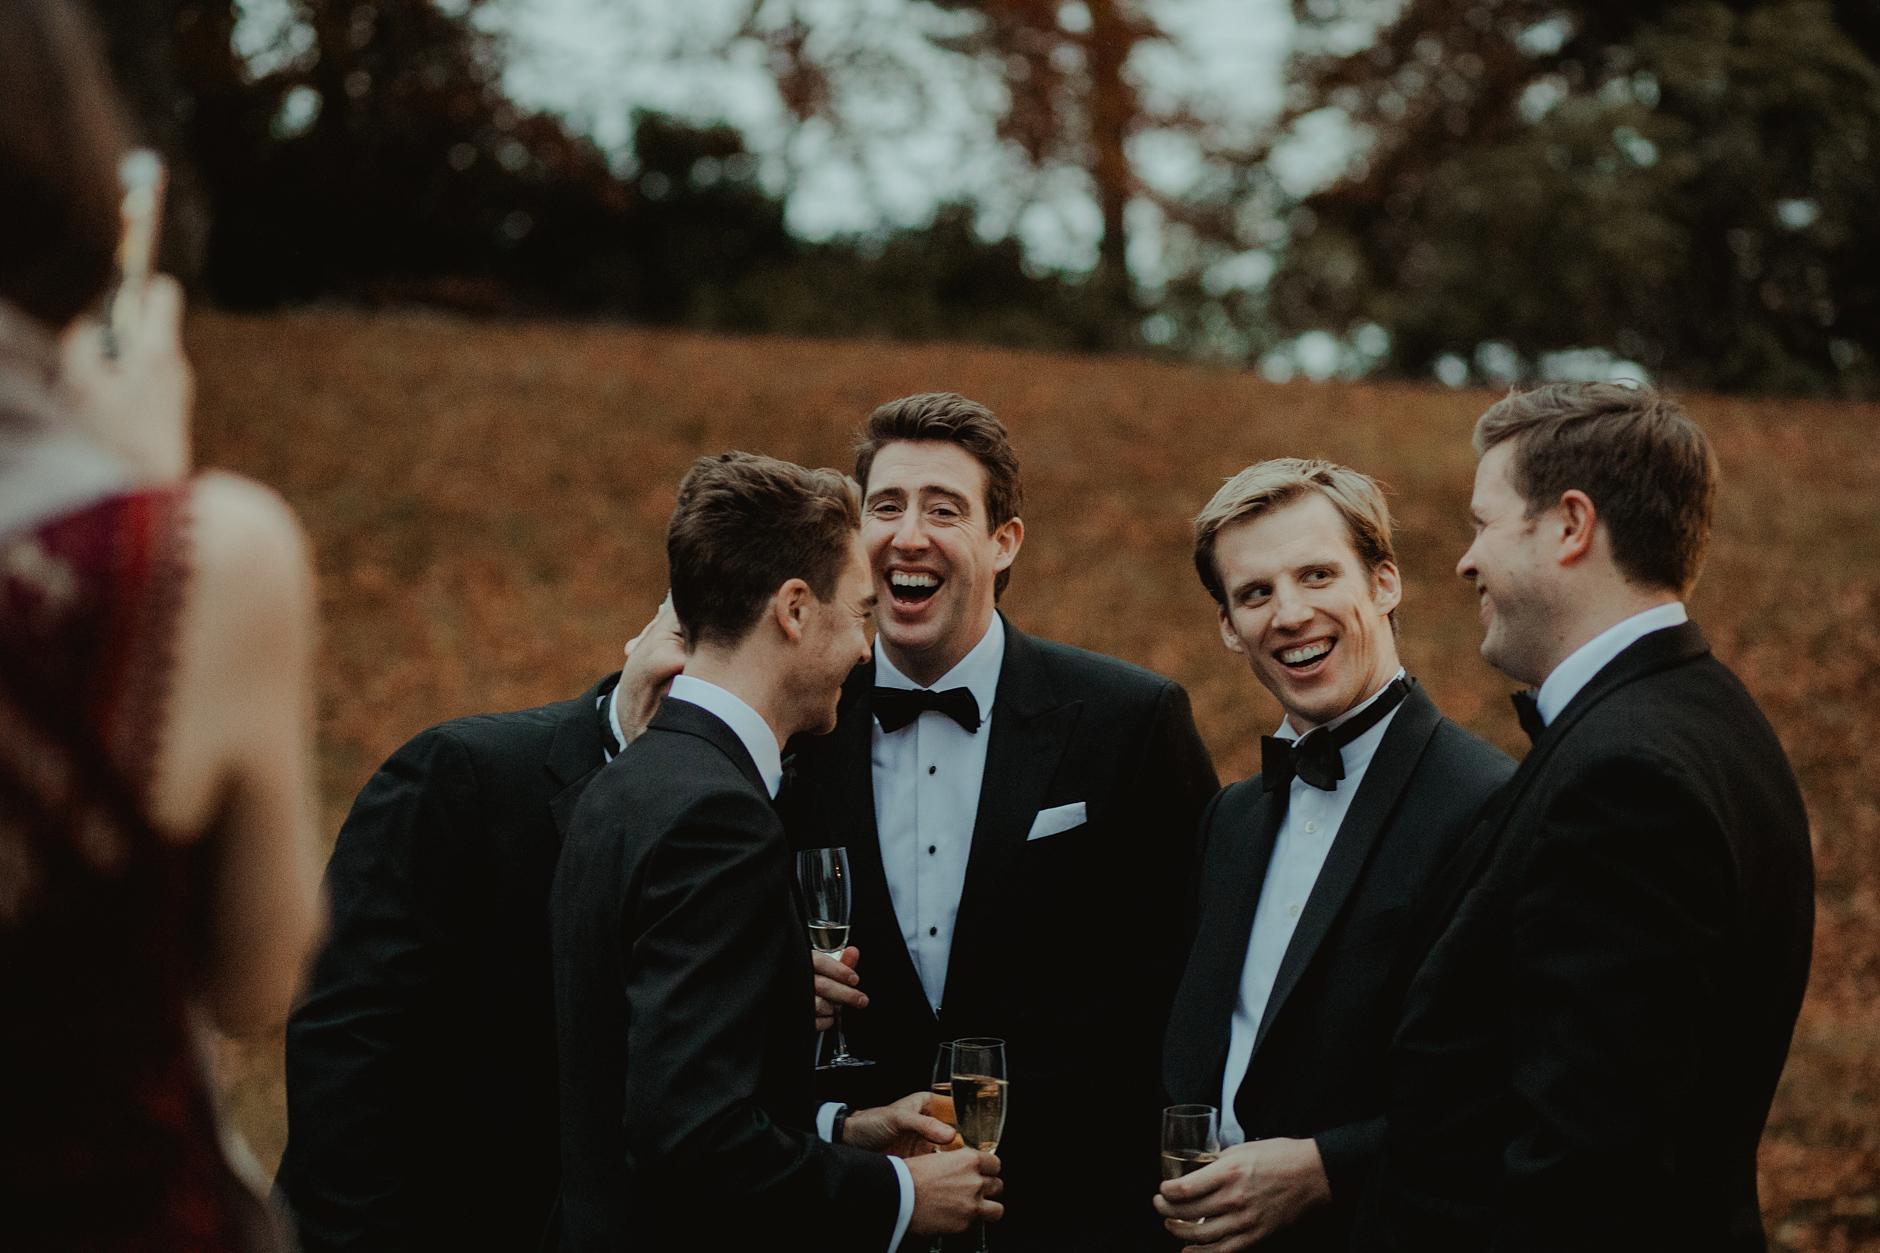 Glentruim-Wedding-Nikki-Leadbetter-Photography-234.jpg